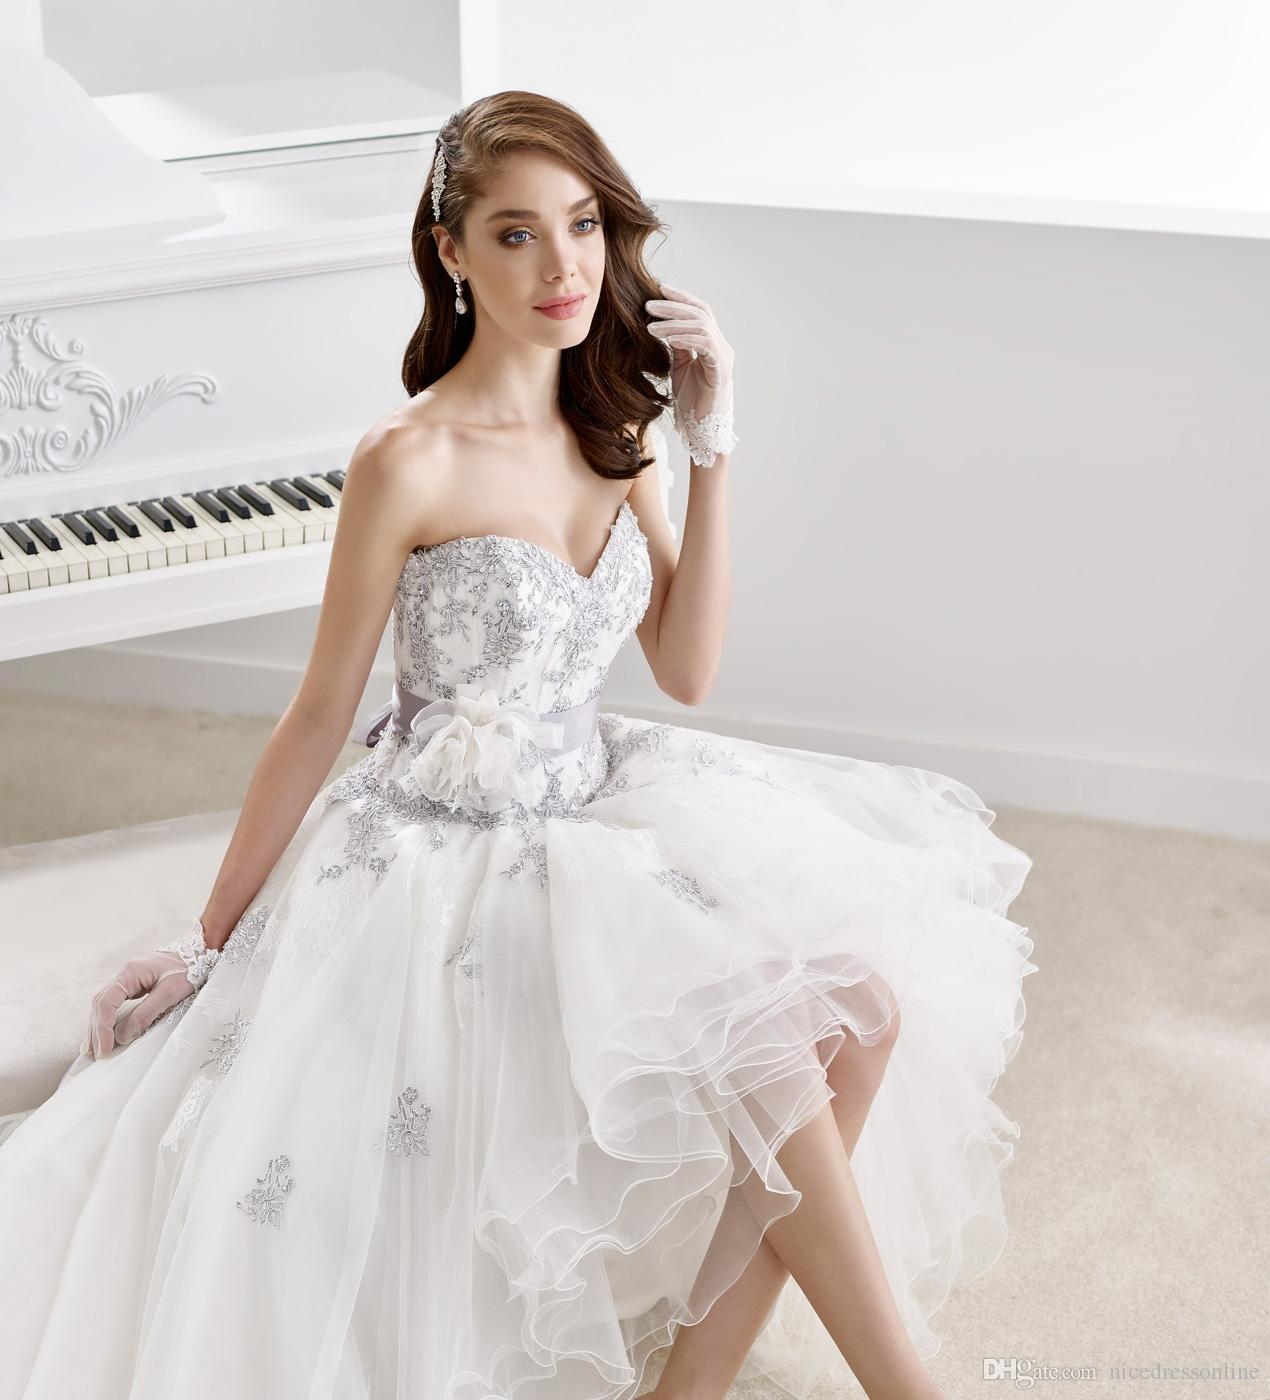 2016 hi lo wedding dresses by nicole spose sweetheart for Hi lo wedding dress